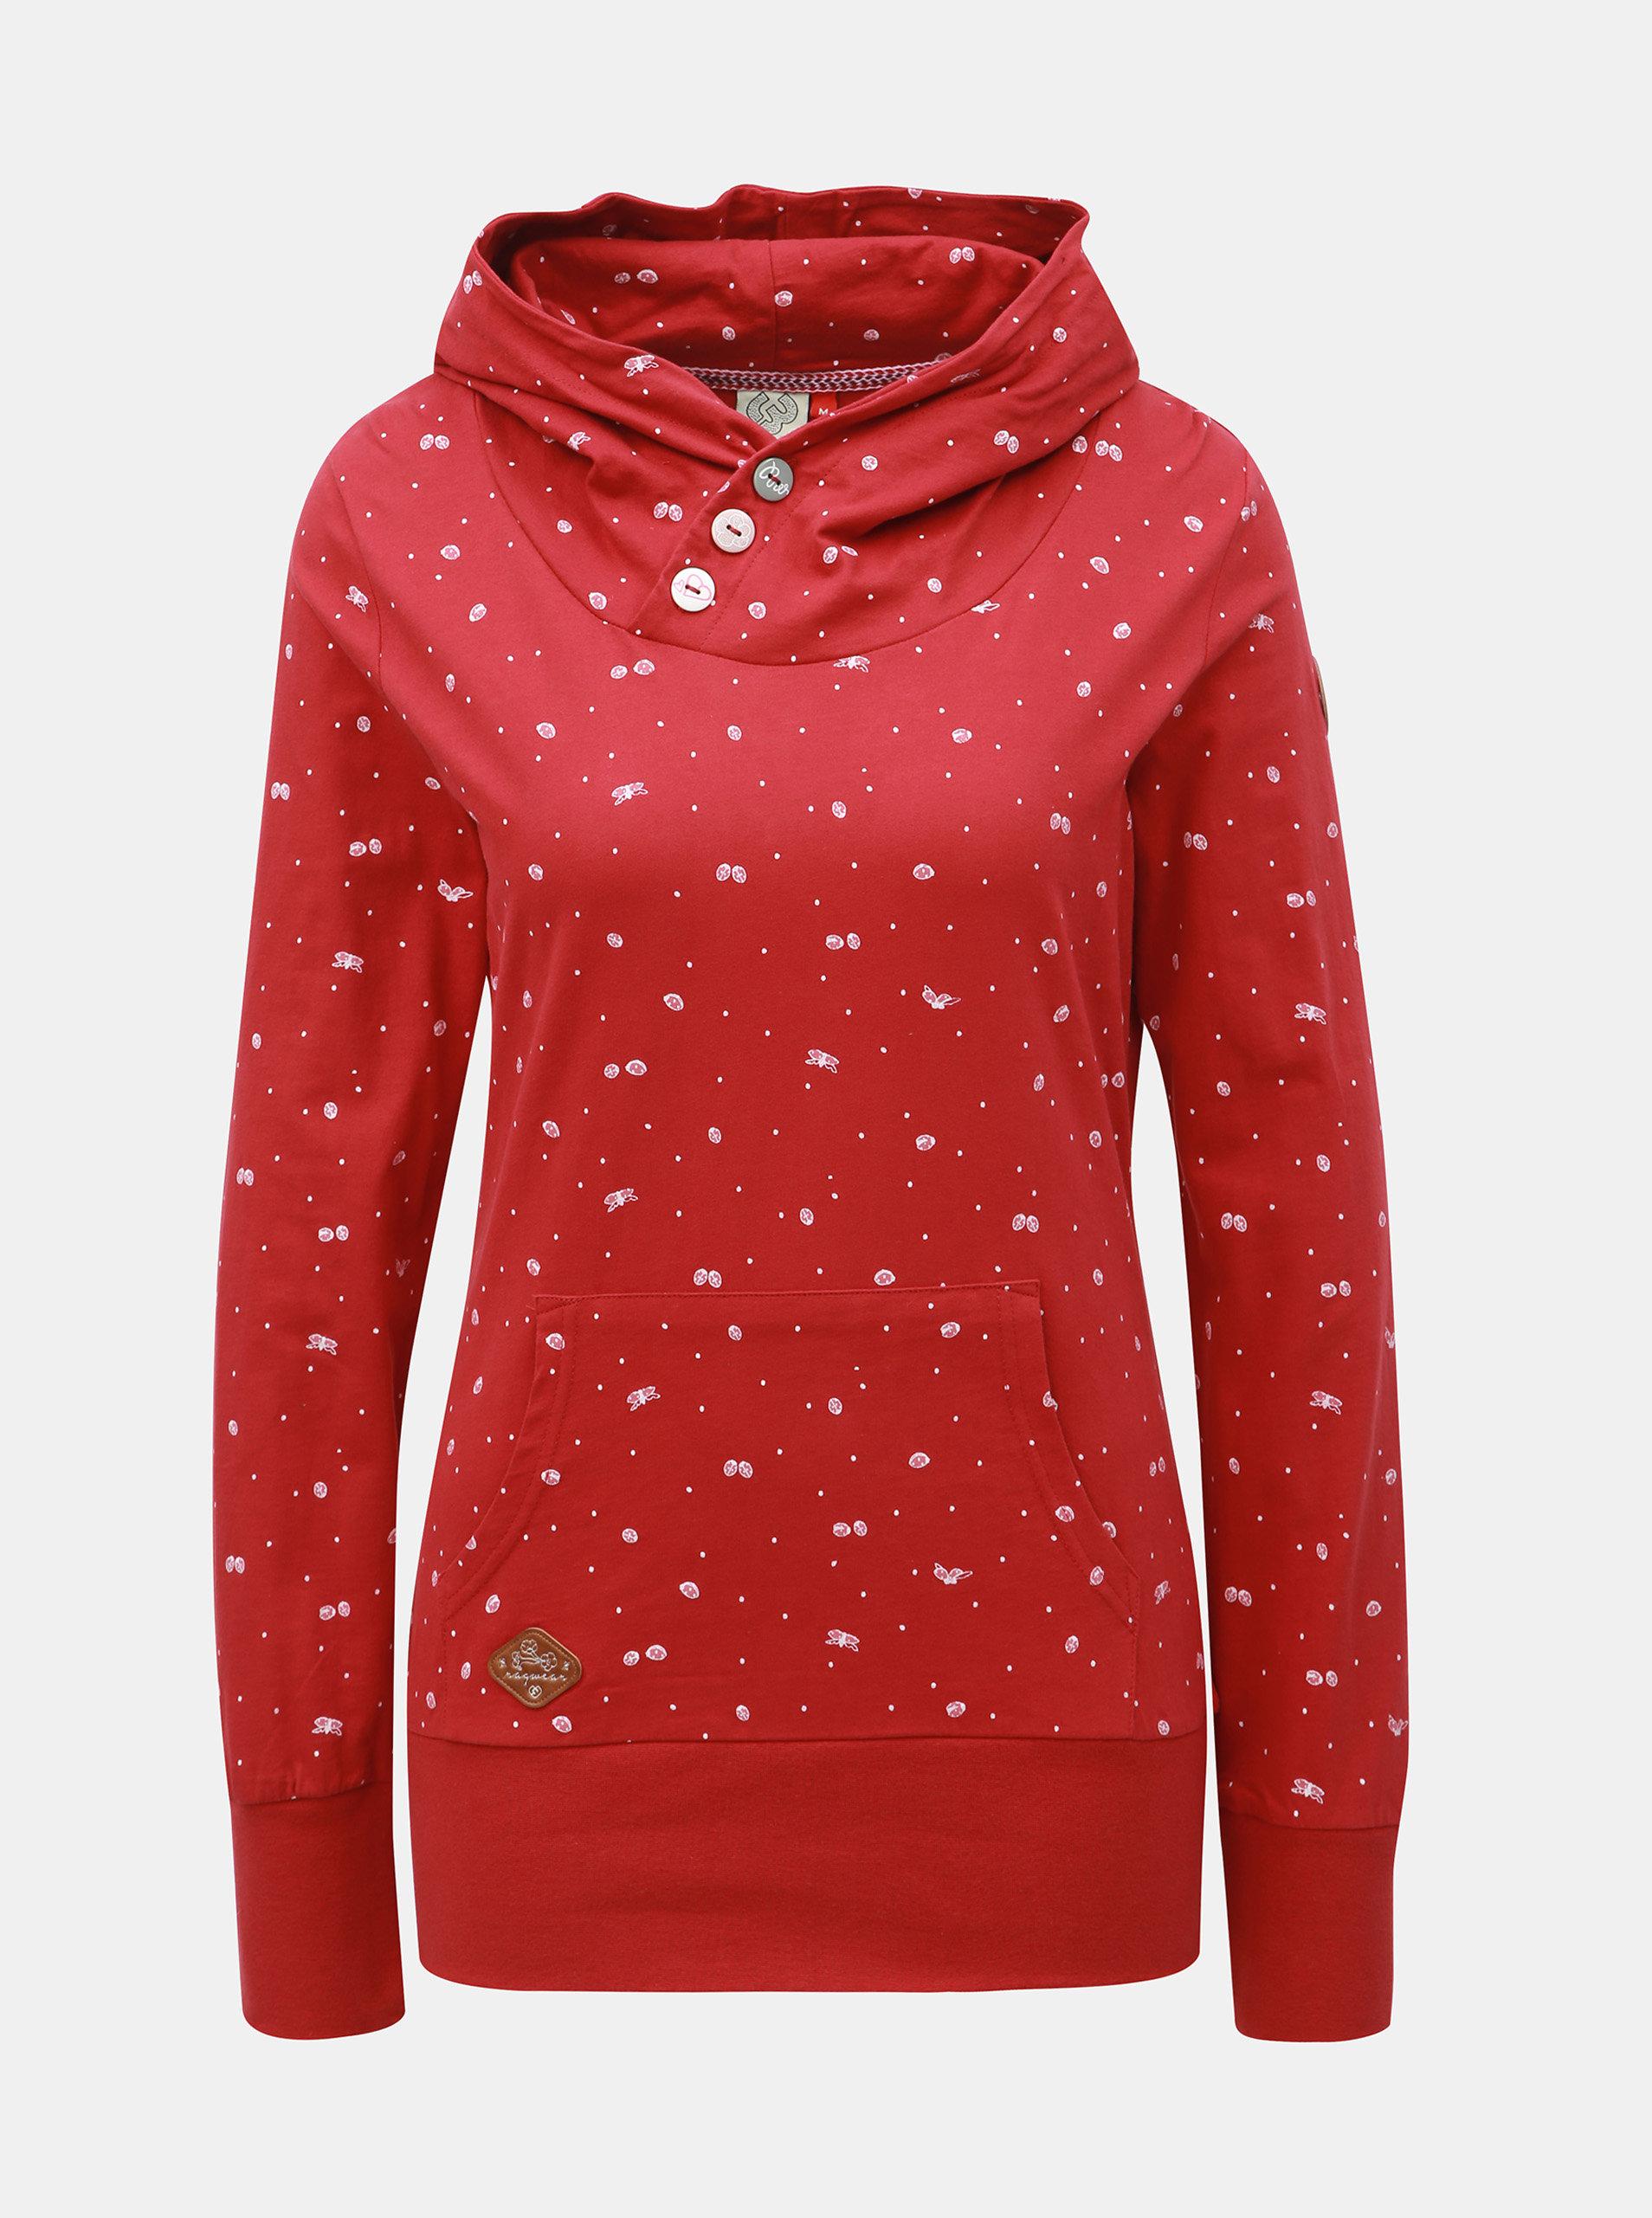 4134571a2ea2 Červená dámska vzorovaná mikina Ragwear Chelsea Bugs ...